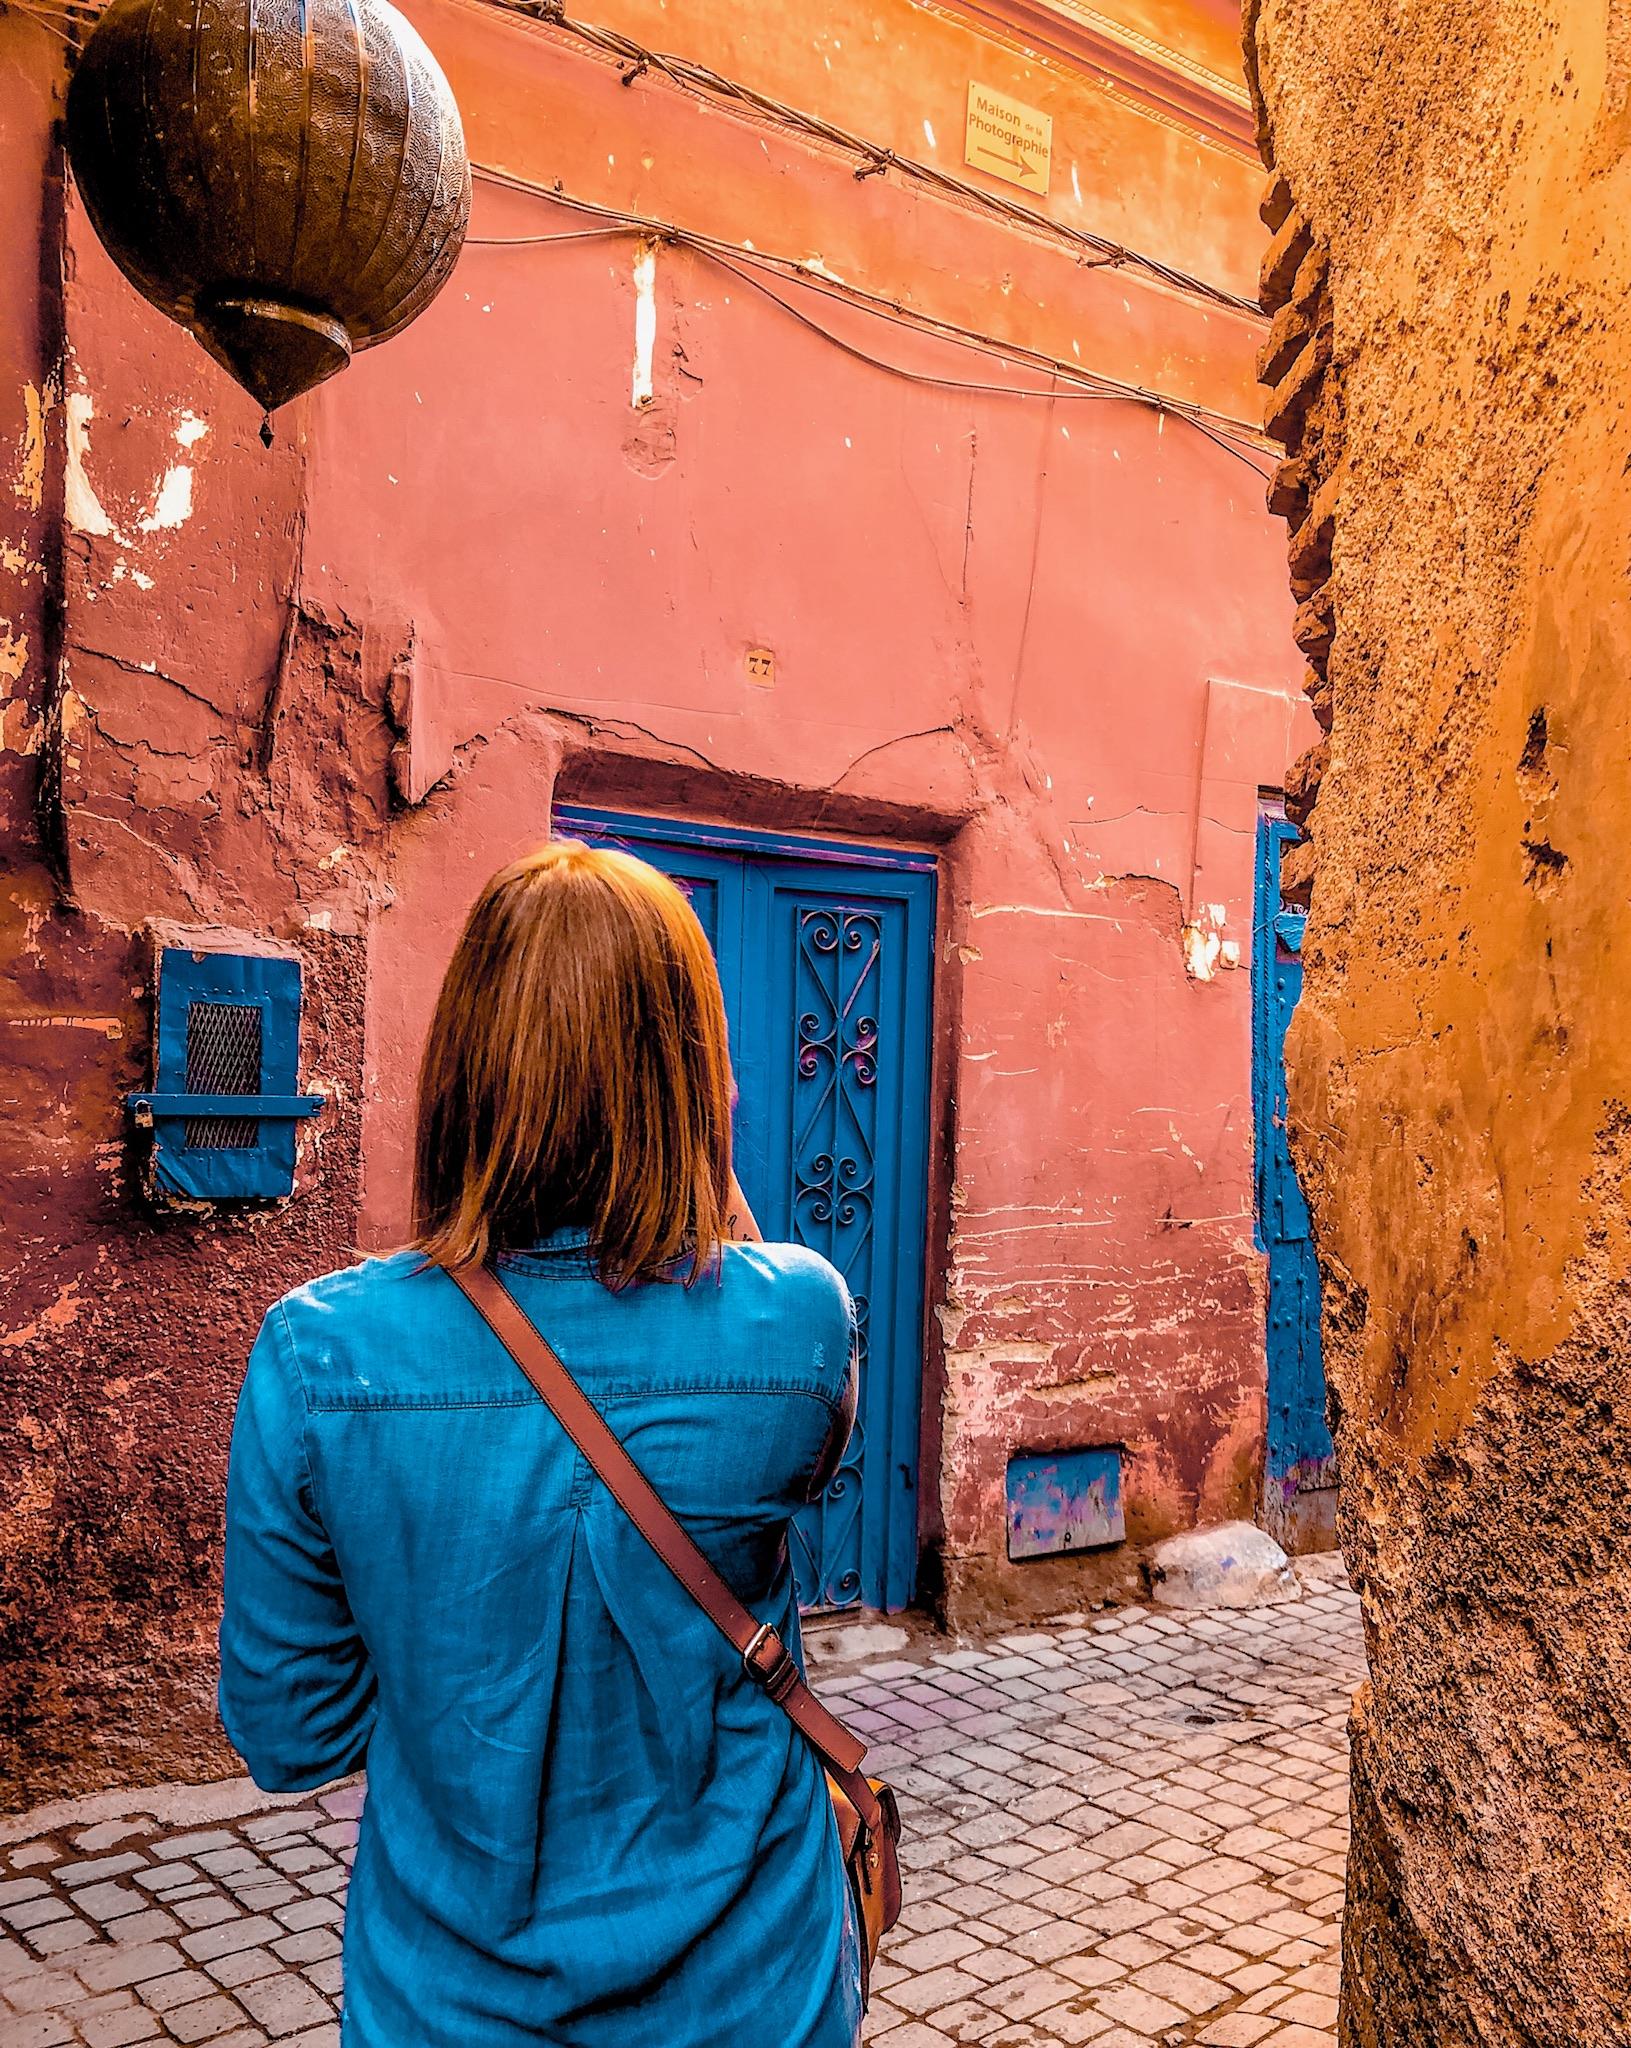 Strolling through Marrakech